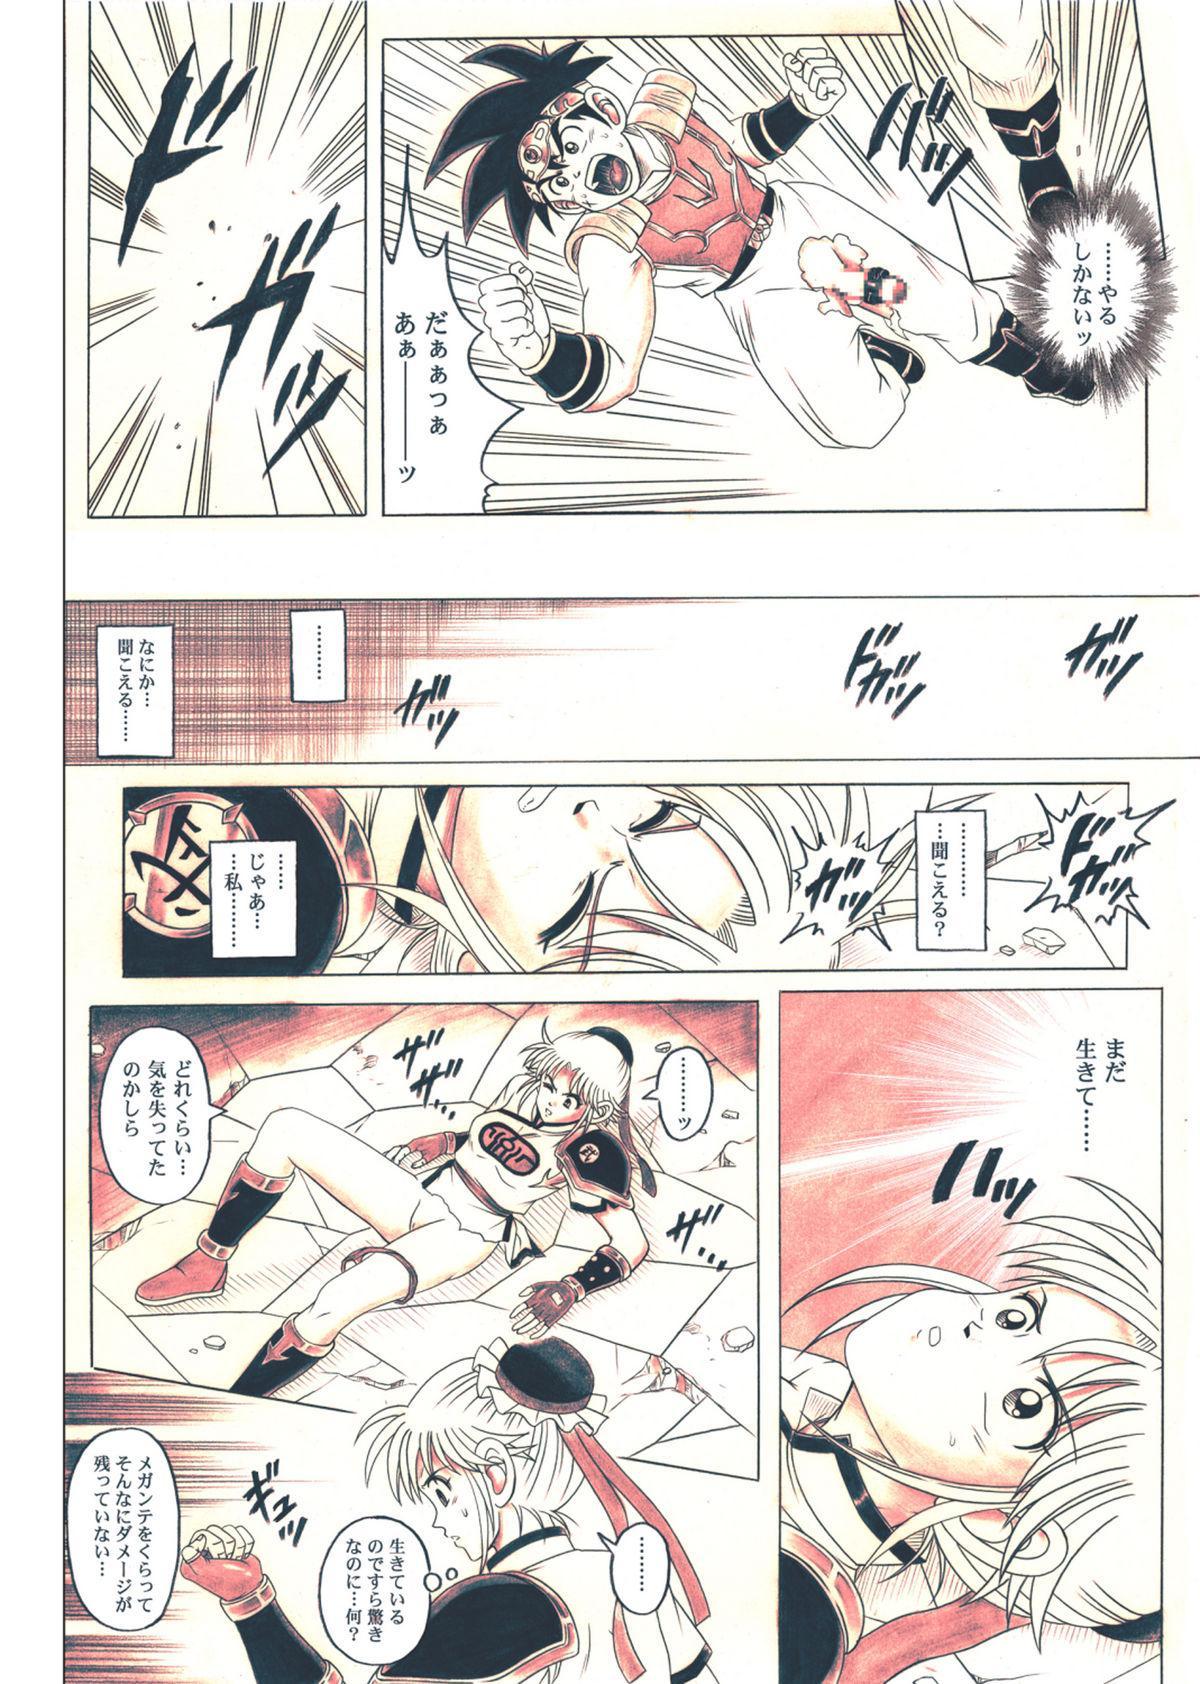 [Cyclone (Reizei, Izumi)] STAR TAC IDO ~Youkuso Haja no Doukutsu he~ Chuuhen Download edition (Dragon Warrior: Dai's Great Adventure) [Digital] 95